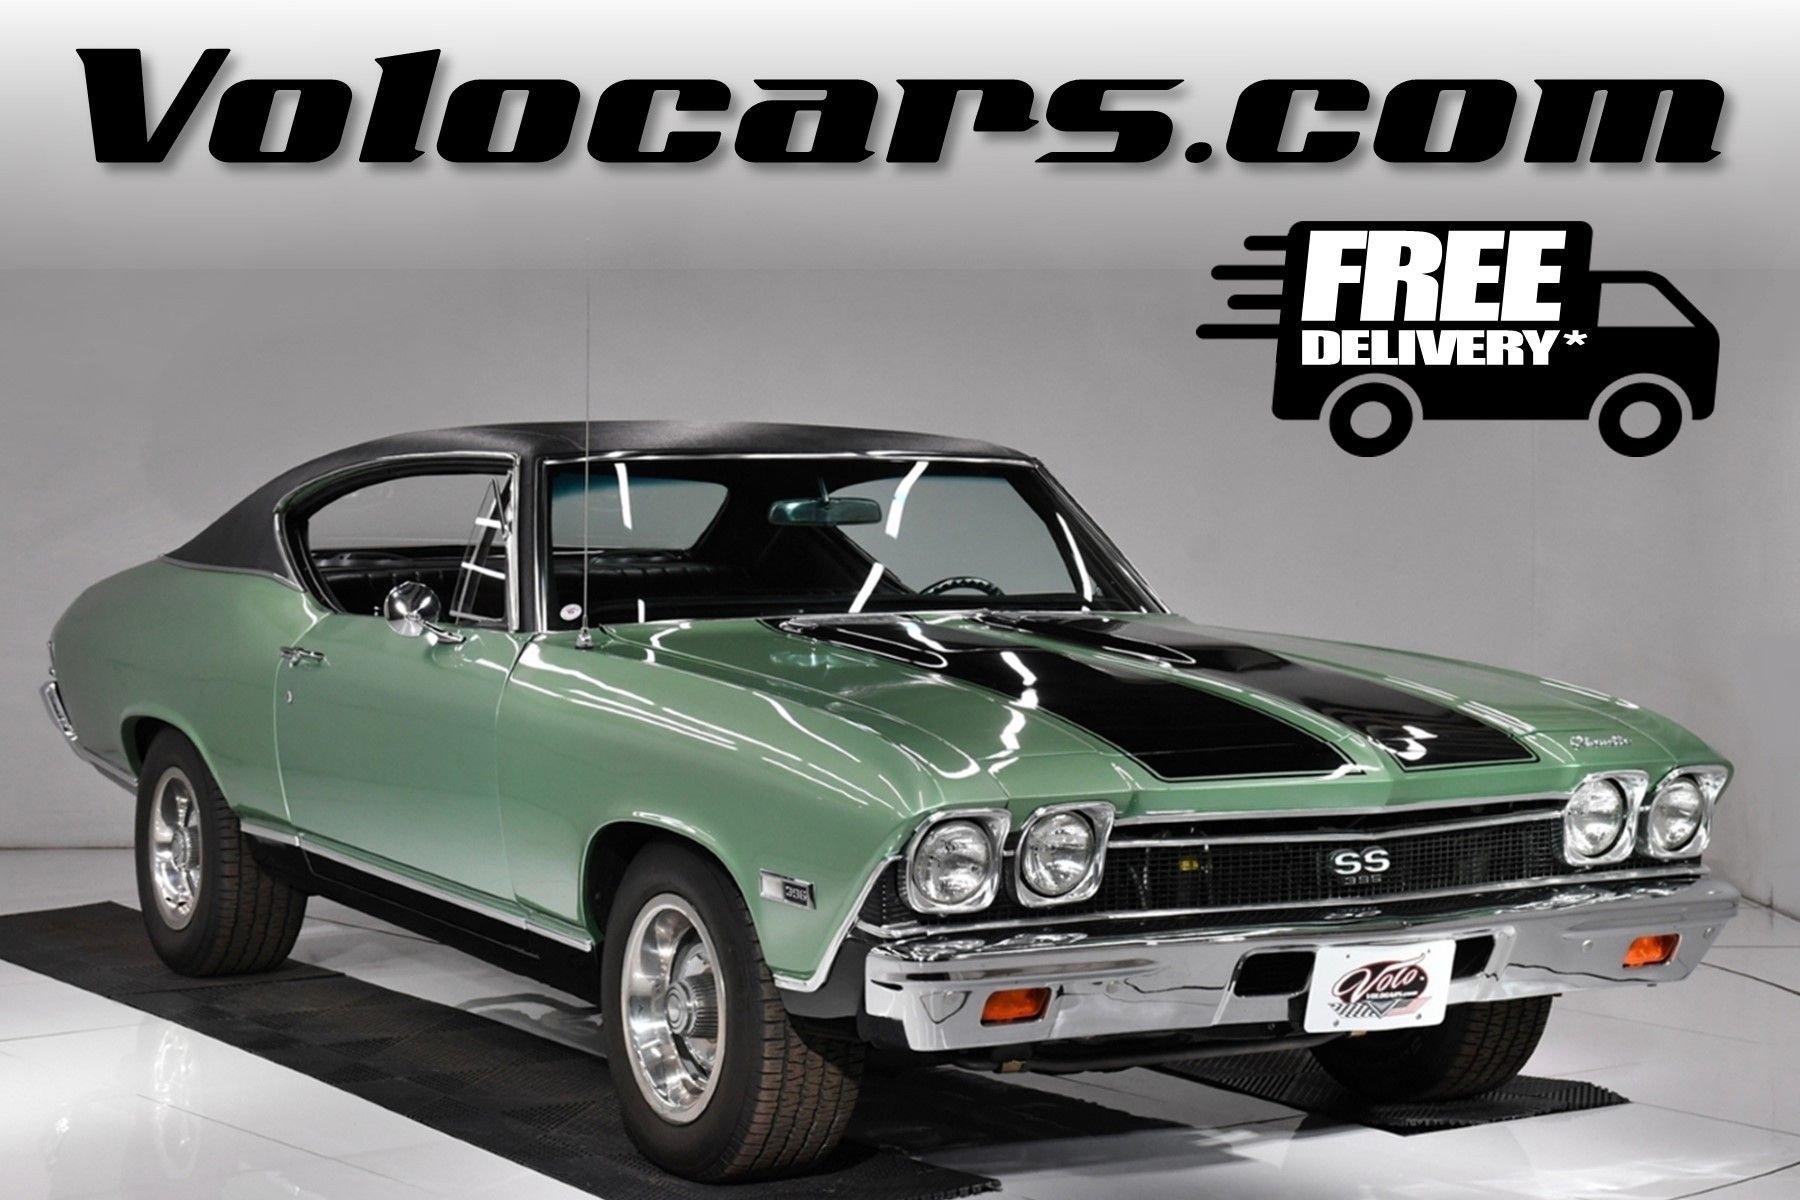 1968 chevrolet chevelle ss 396 tribute